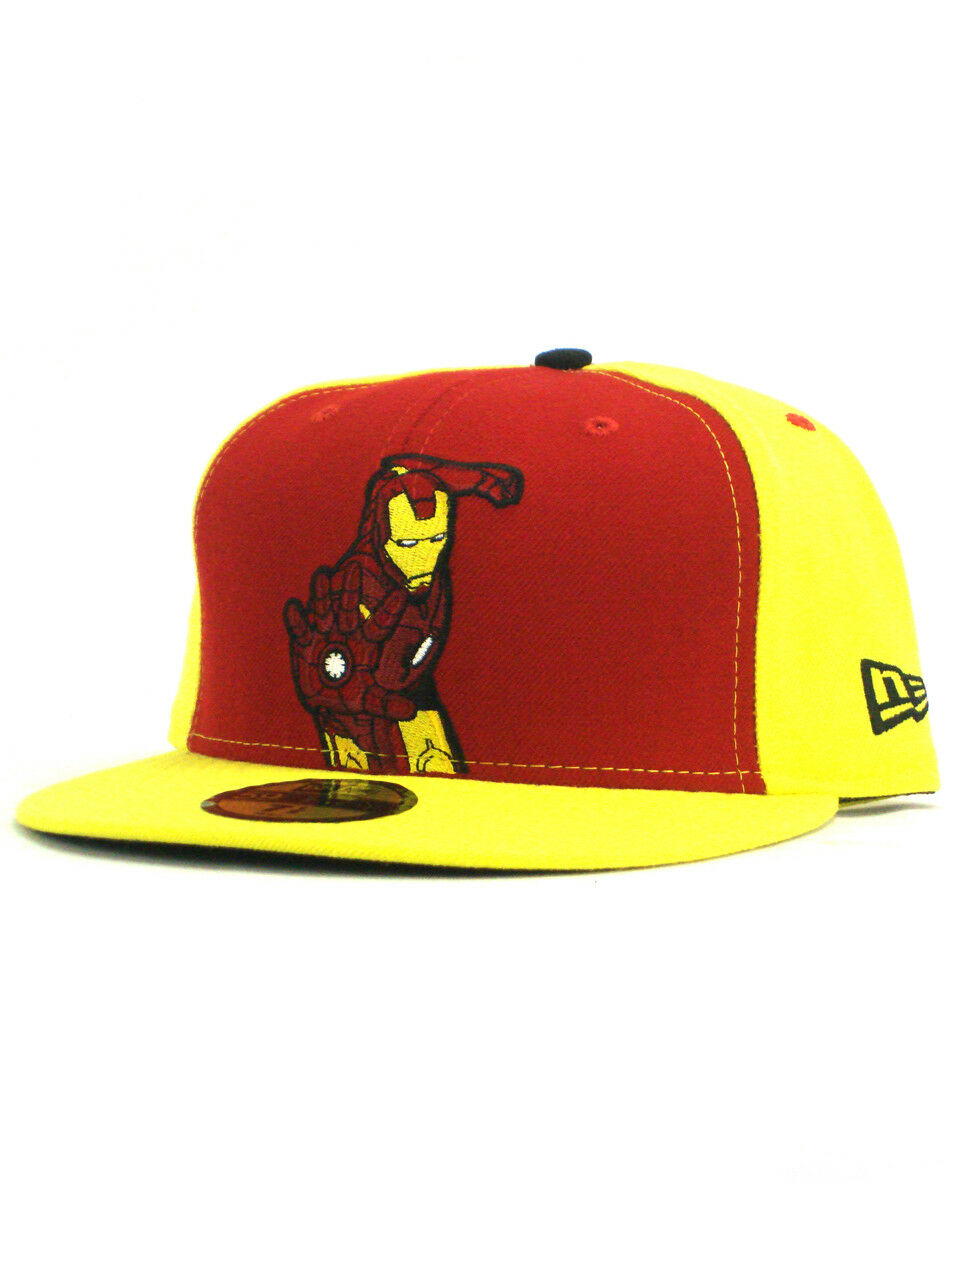 New Era Iron Custom Man 59fifty Custom Iron Fitted Hat Size 7 1/2 Classic Repulsor Blast NWT a1bc95